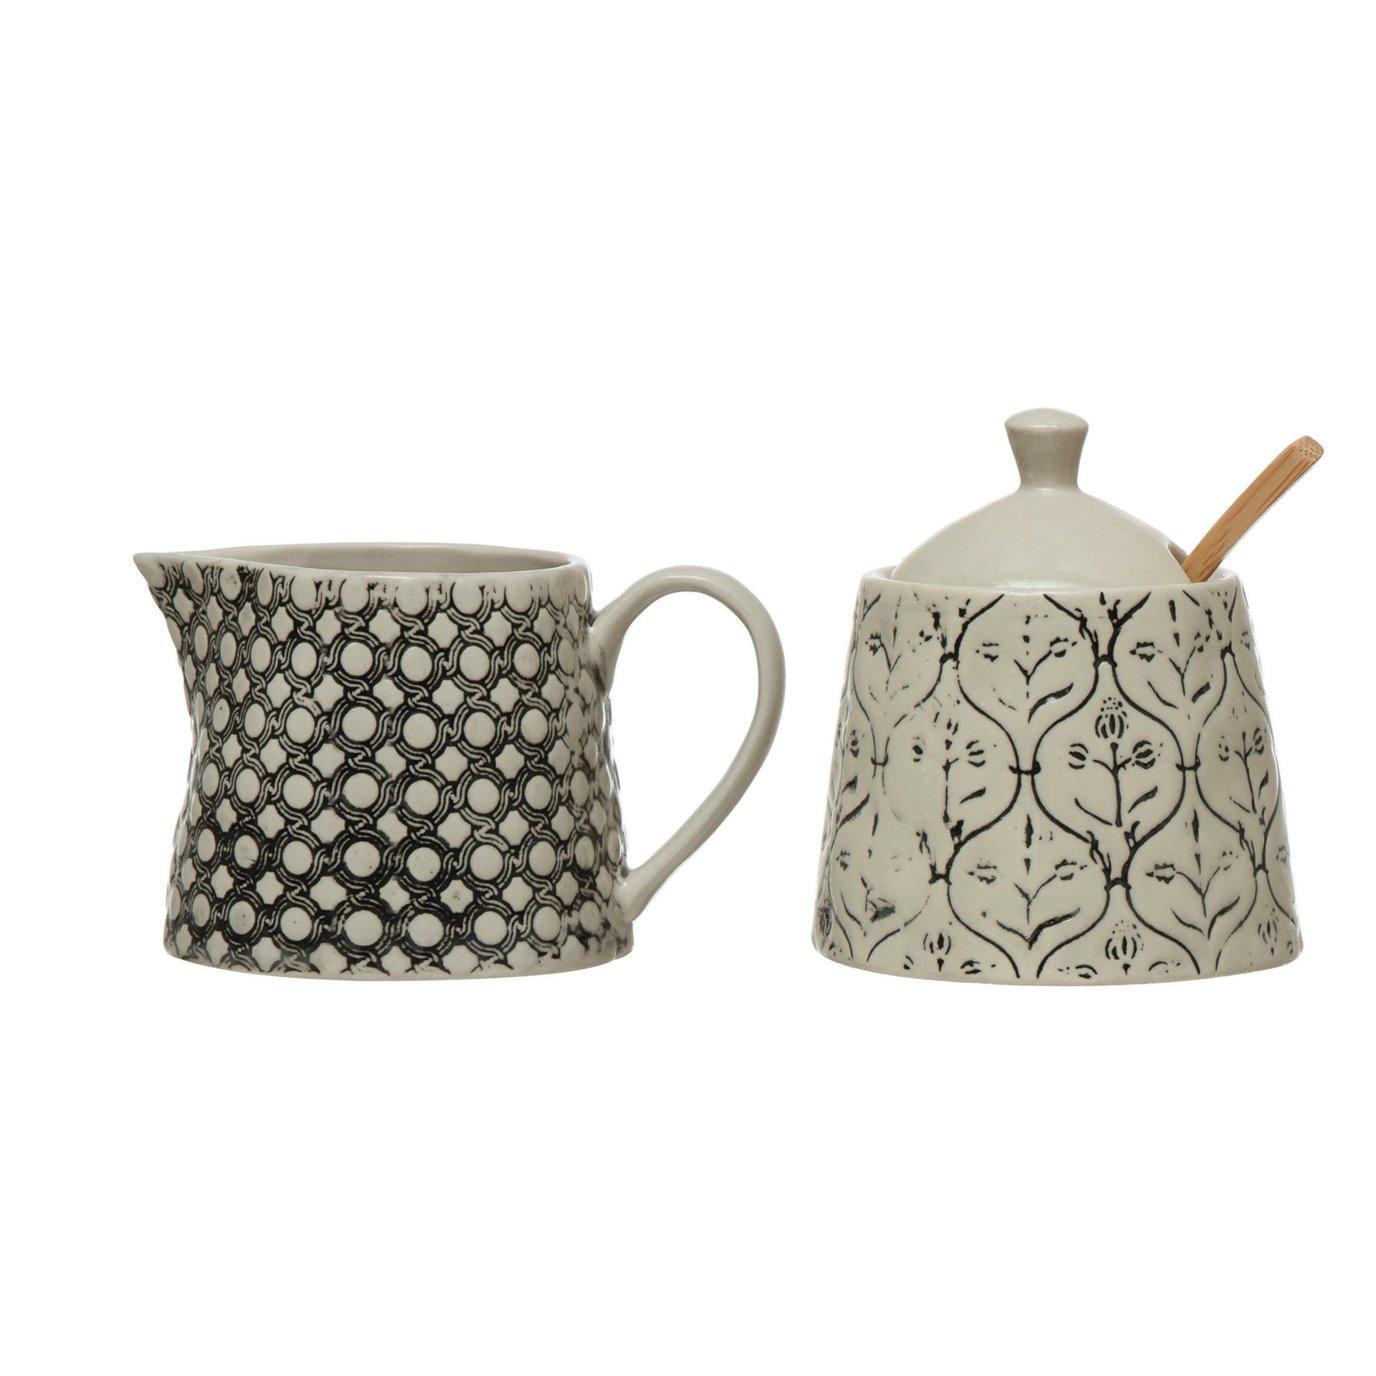 "6 oz. Hand-Stamped Stoneware Creamer & 3-1/2"" Round x 4""H 8 oz. Sugar Jar with Lid, Wood Spoon & Embossed Pattern, Black & Cream Color, Set of 3"